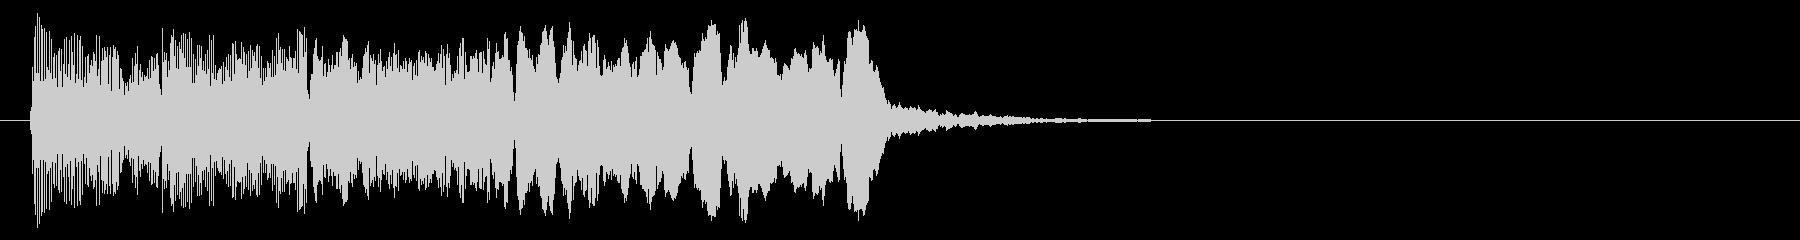 8bitパワーup-01-3_revの未再生の波形